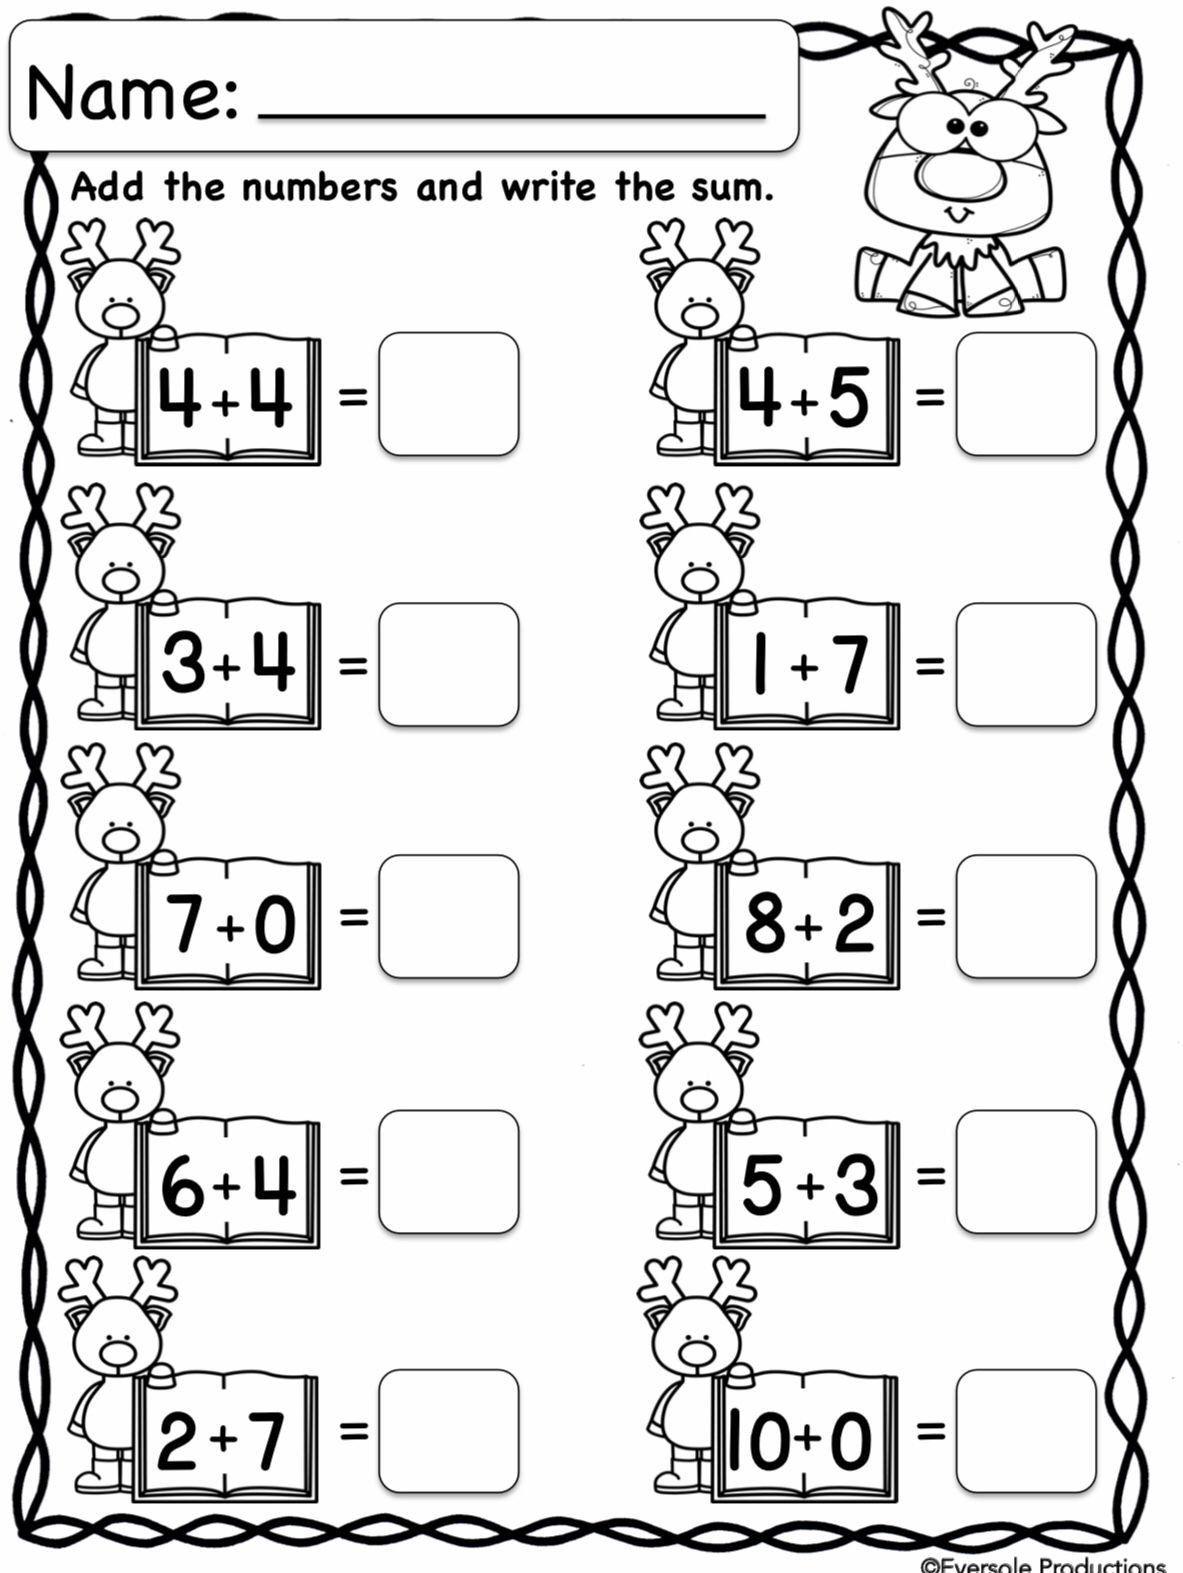 Christmas Math Worksheets 1st Grade Christmas Math In 2020 Kindergarten Math Worksheets Kindergarten Math Worksheets Addition Kindergarten Subtraction Worksheets Addition worksheets sum of 20